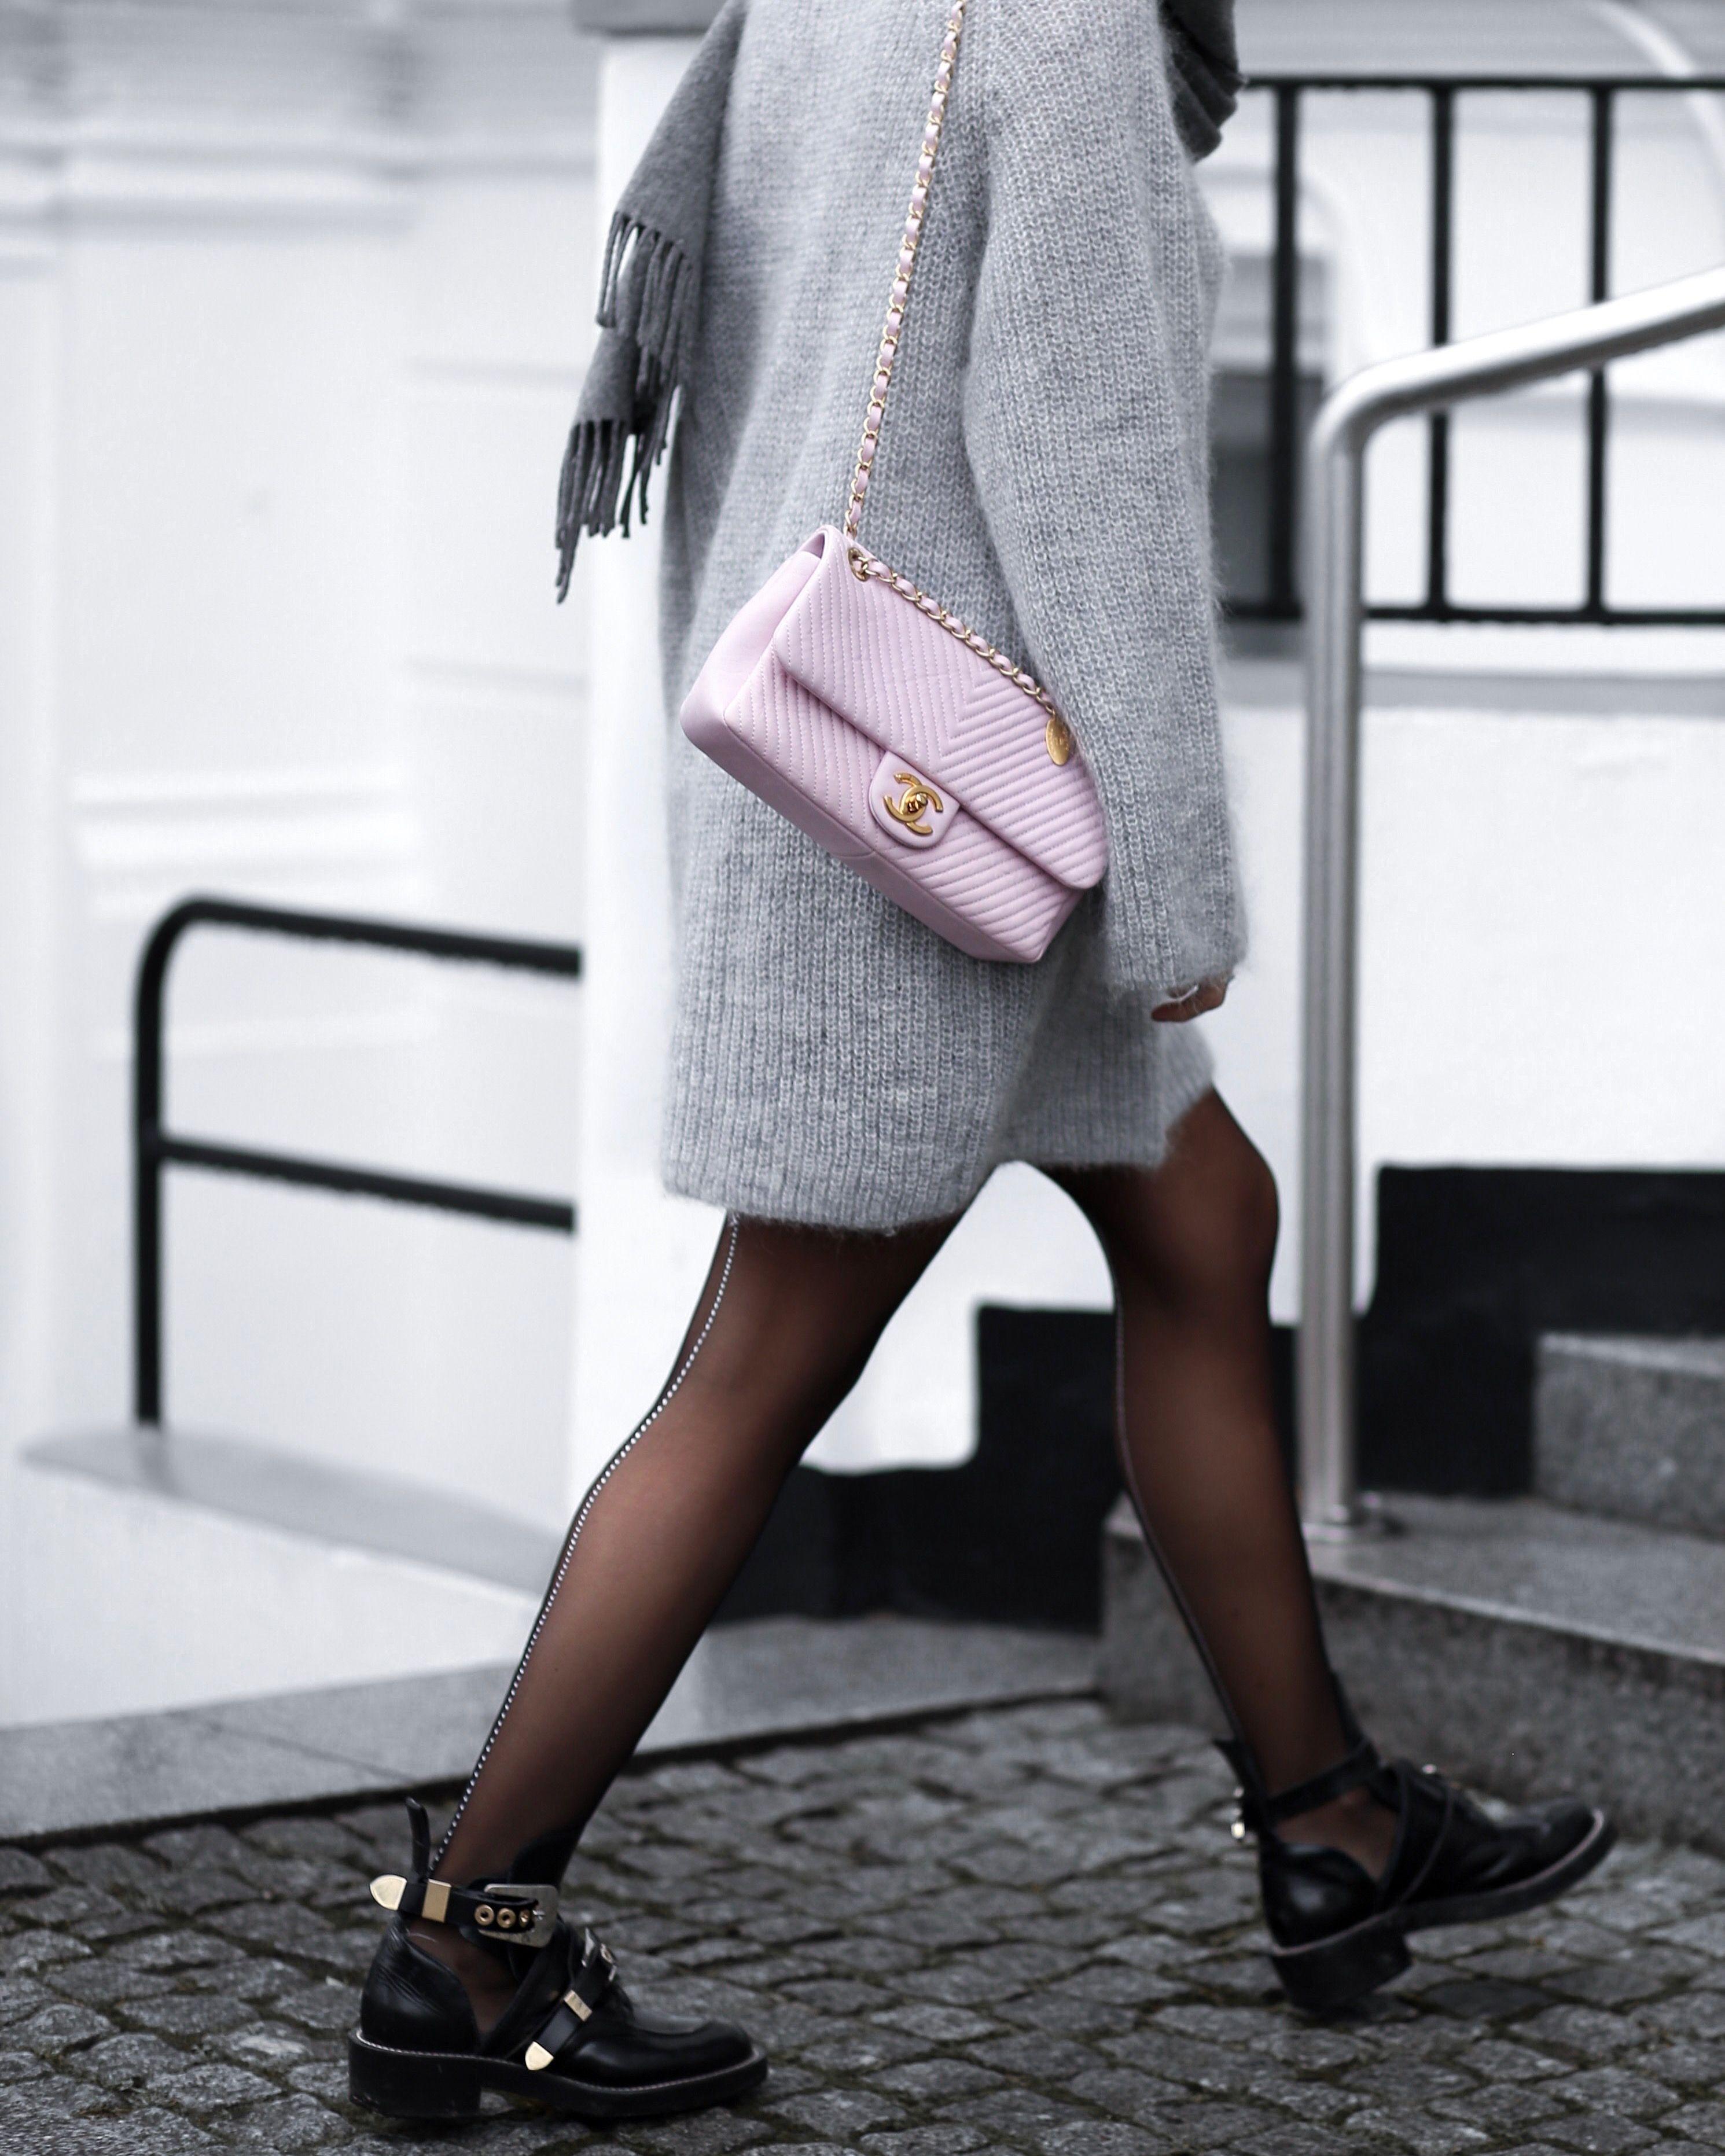 b65570e06a7b8d Chanel pink bag - balenciaga ceinture boots